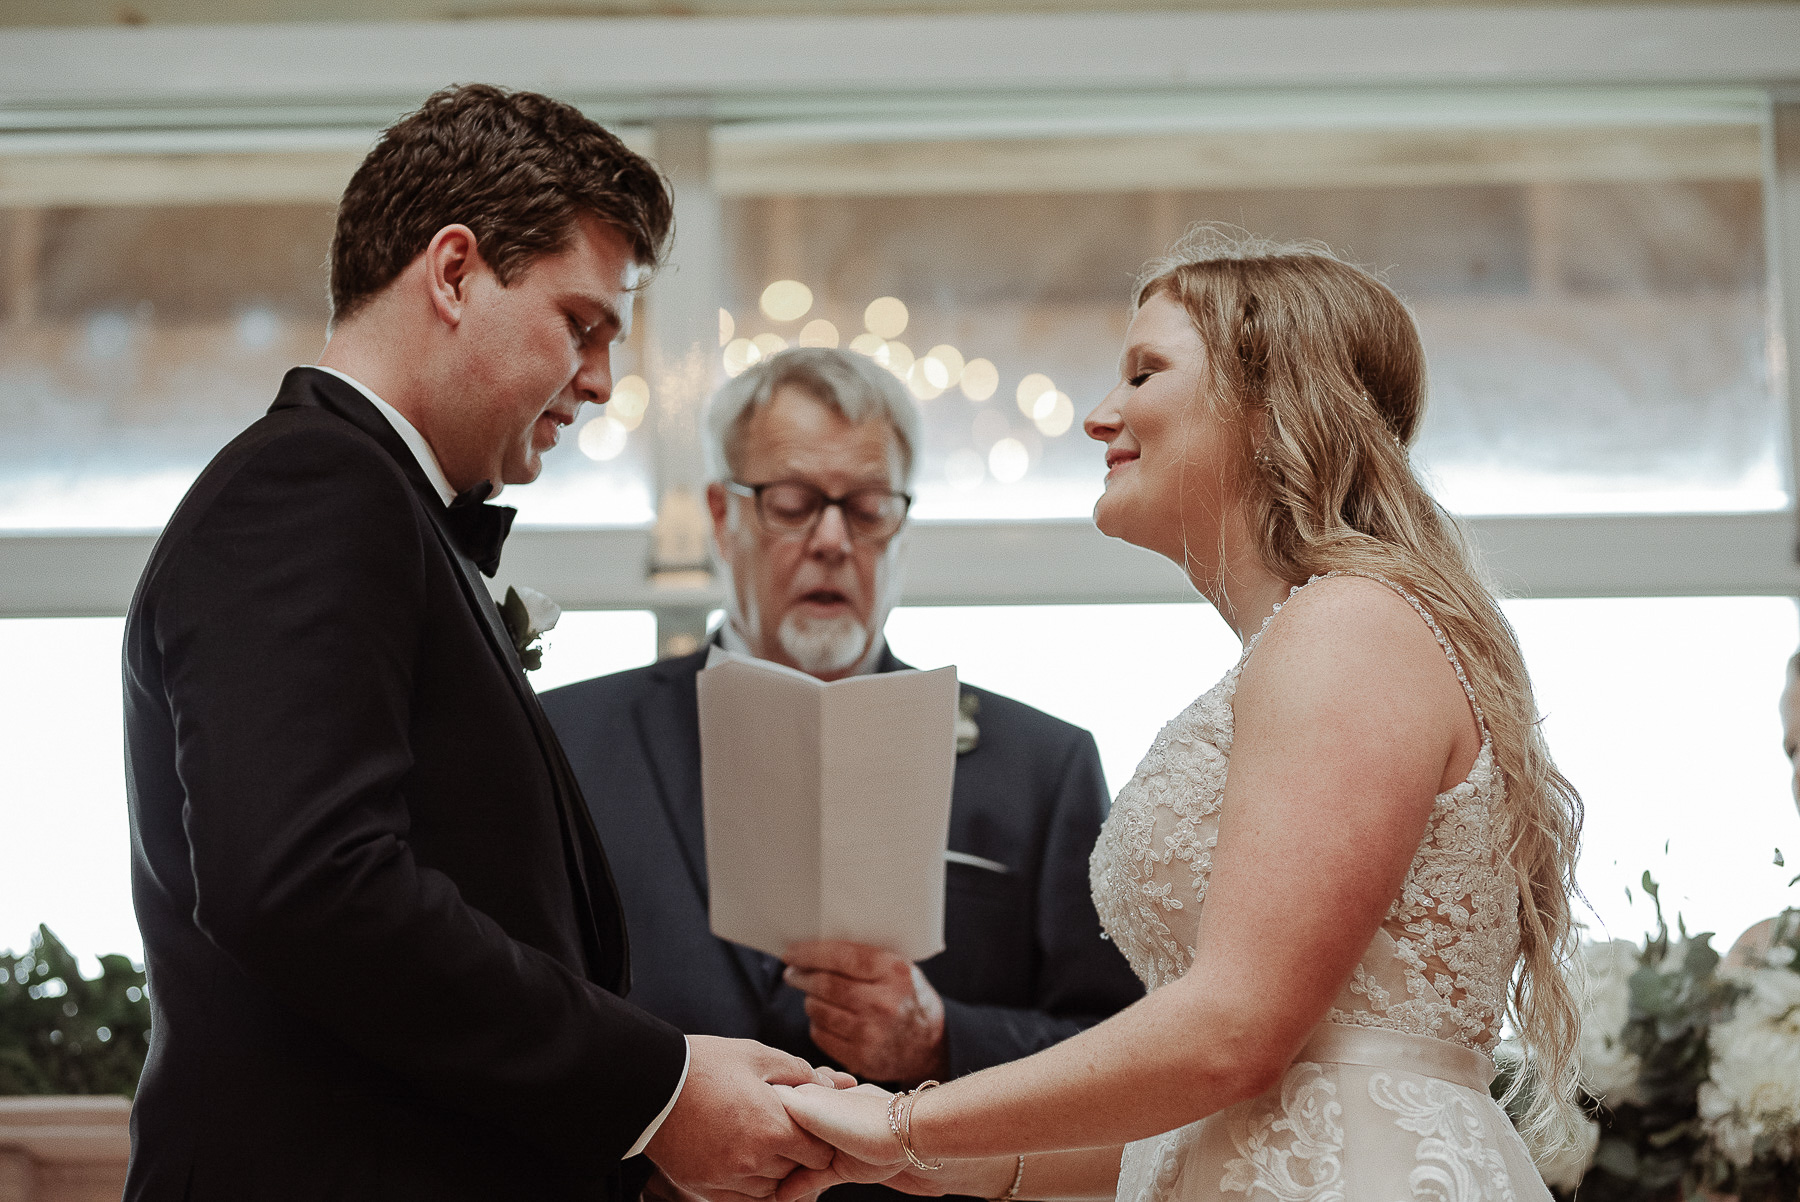 enowen-wedding-photography-overlook-barn-nc-lyndly-liam-blog (35 of 19).jpg